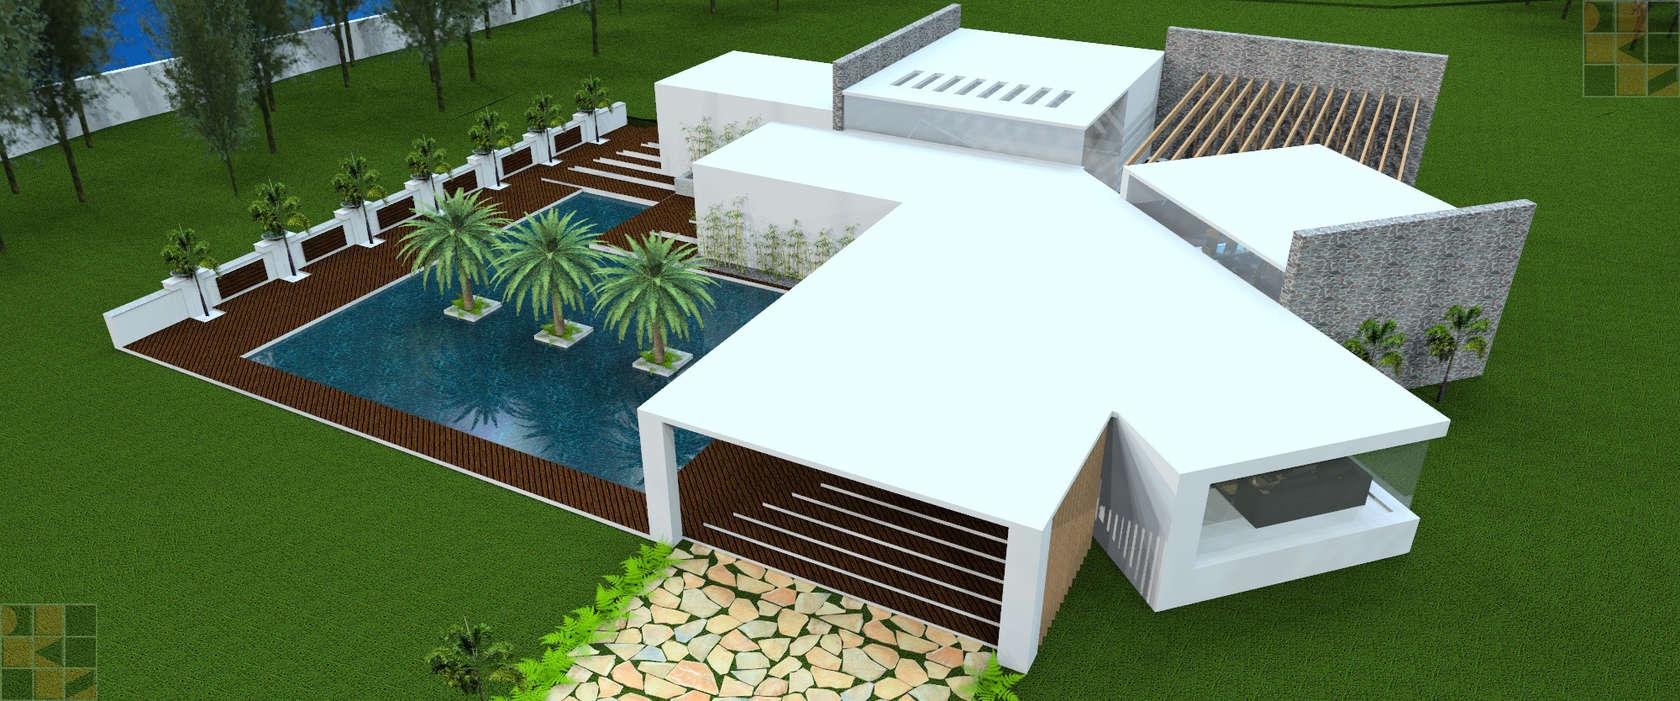 Architecture Farmhouse Design And Development For Mrs